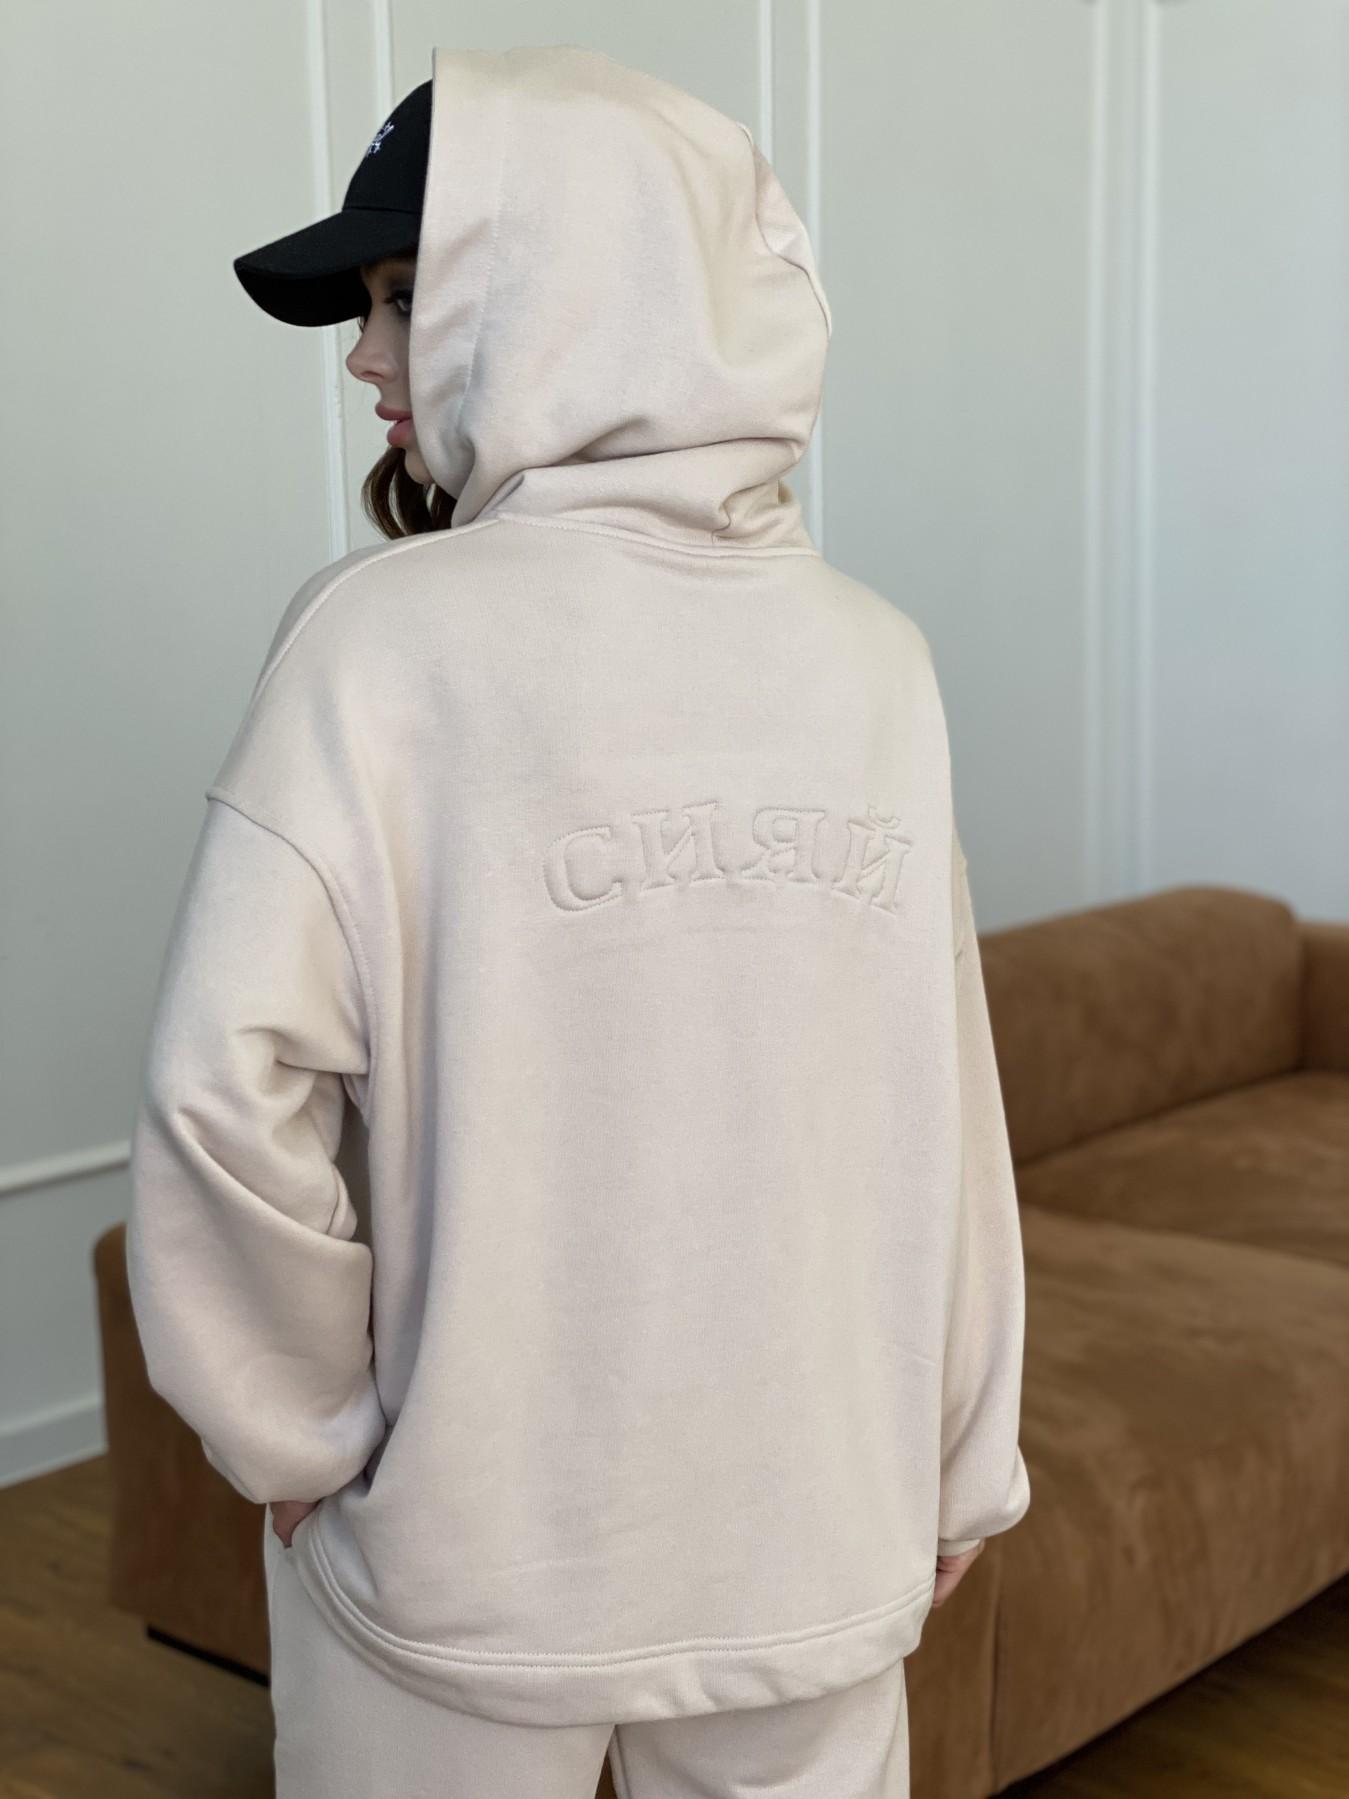 Сияй костюм из  3х нитки с накаткой 11249 АРТ. 47770 Цвет: Бежевый - фото 8, интернет магазин tm-modus.ru